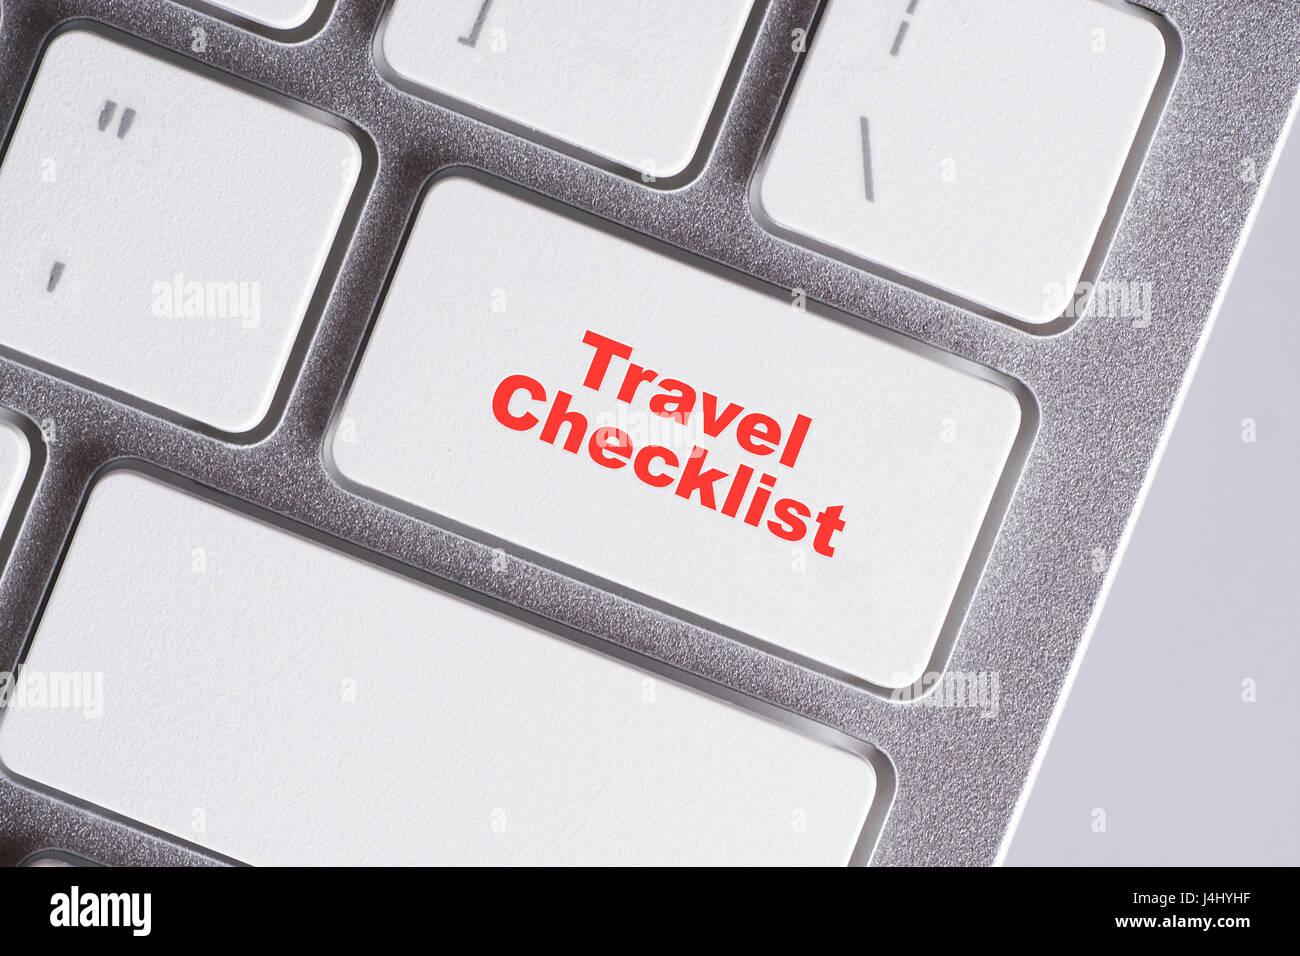 travel checklist stock photos travel checklist stock images alamy